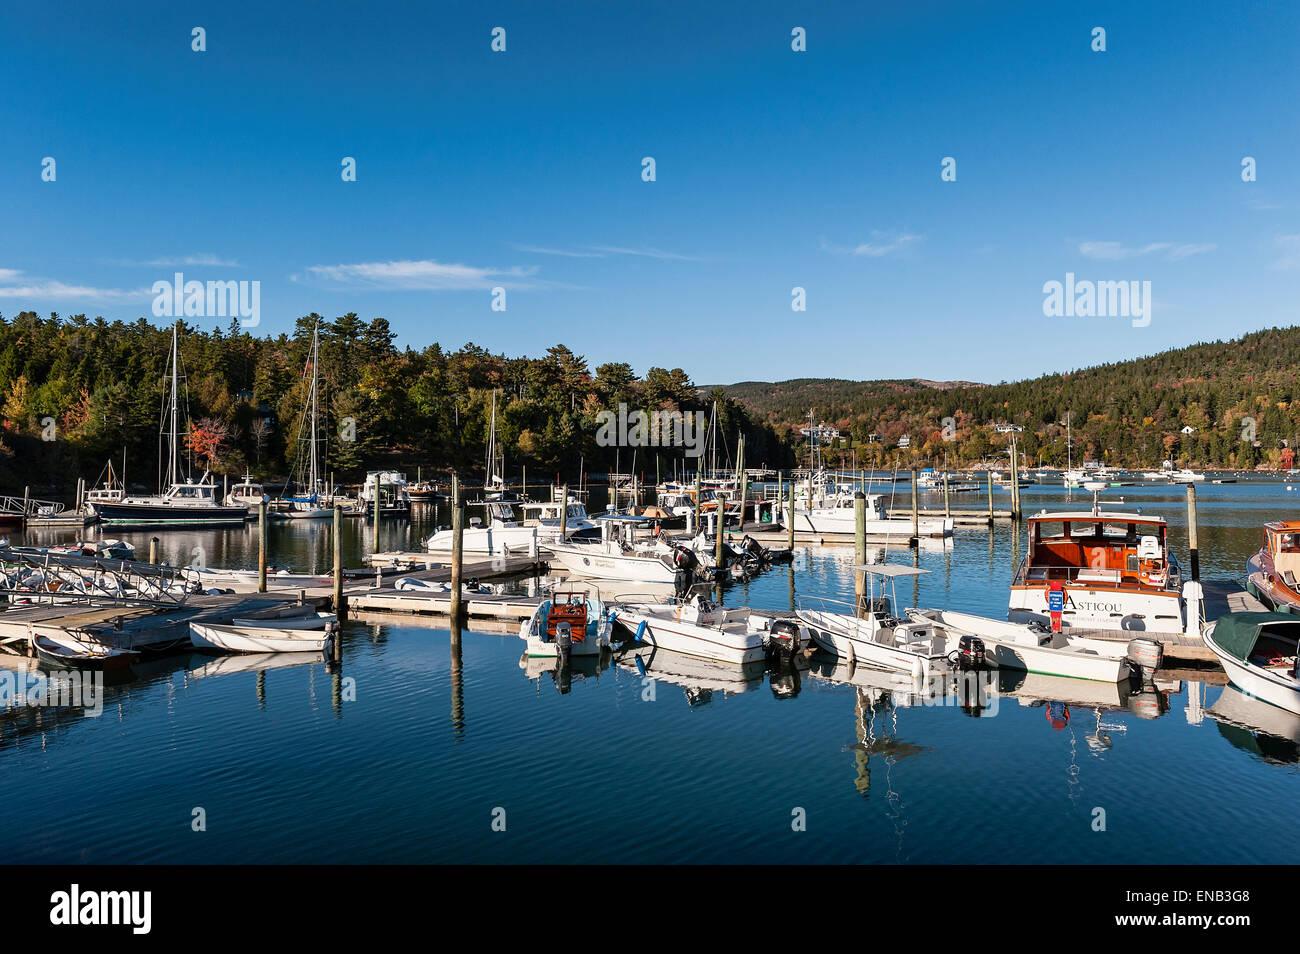 Northeast Harbor, Maine, USA - Stock Image